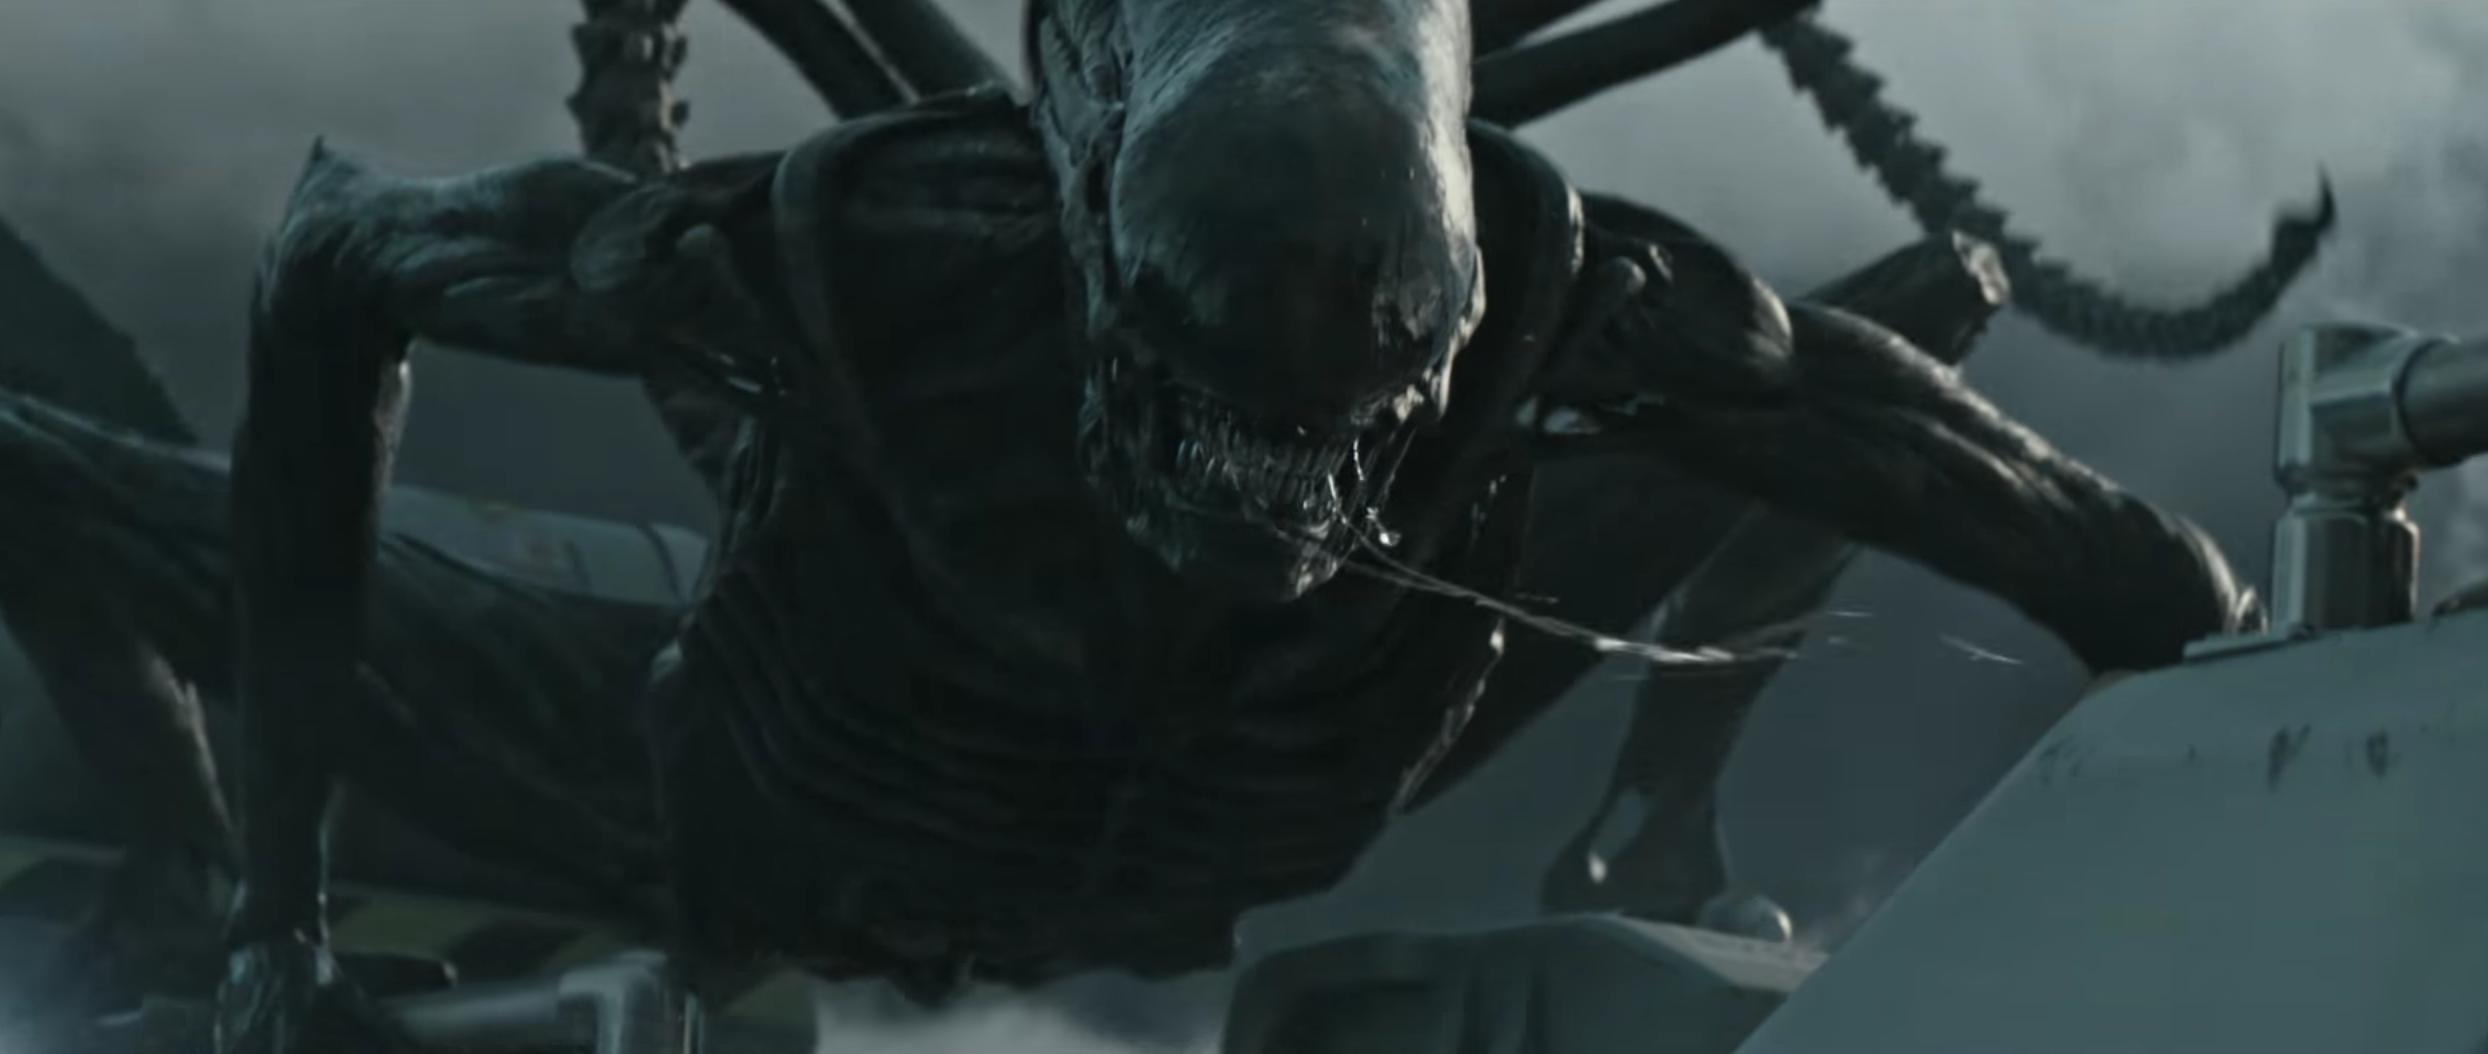 'Alien: Covenant' trailer shows the full power and horror of the Xenomorph